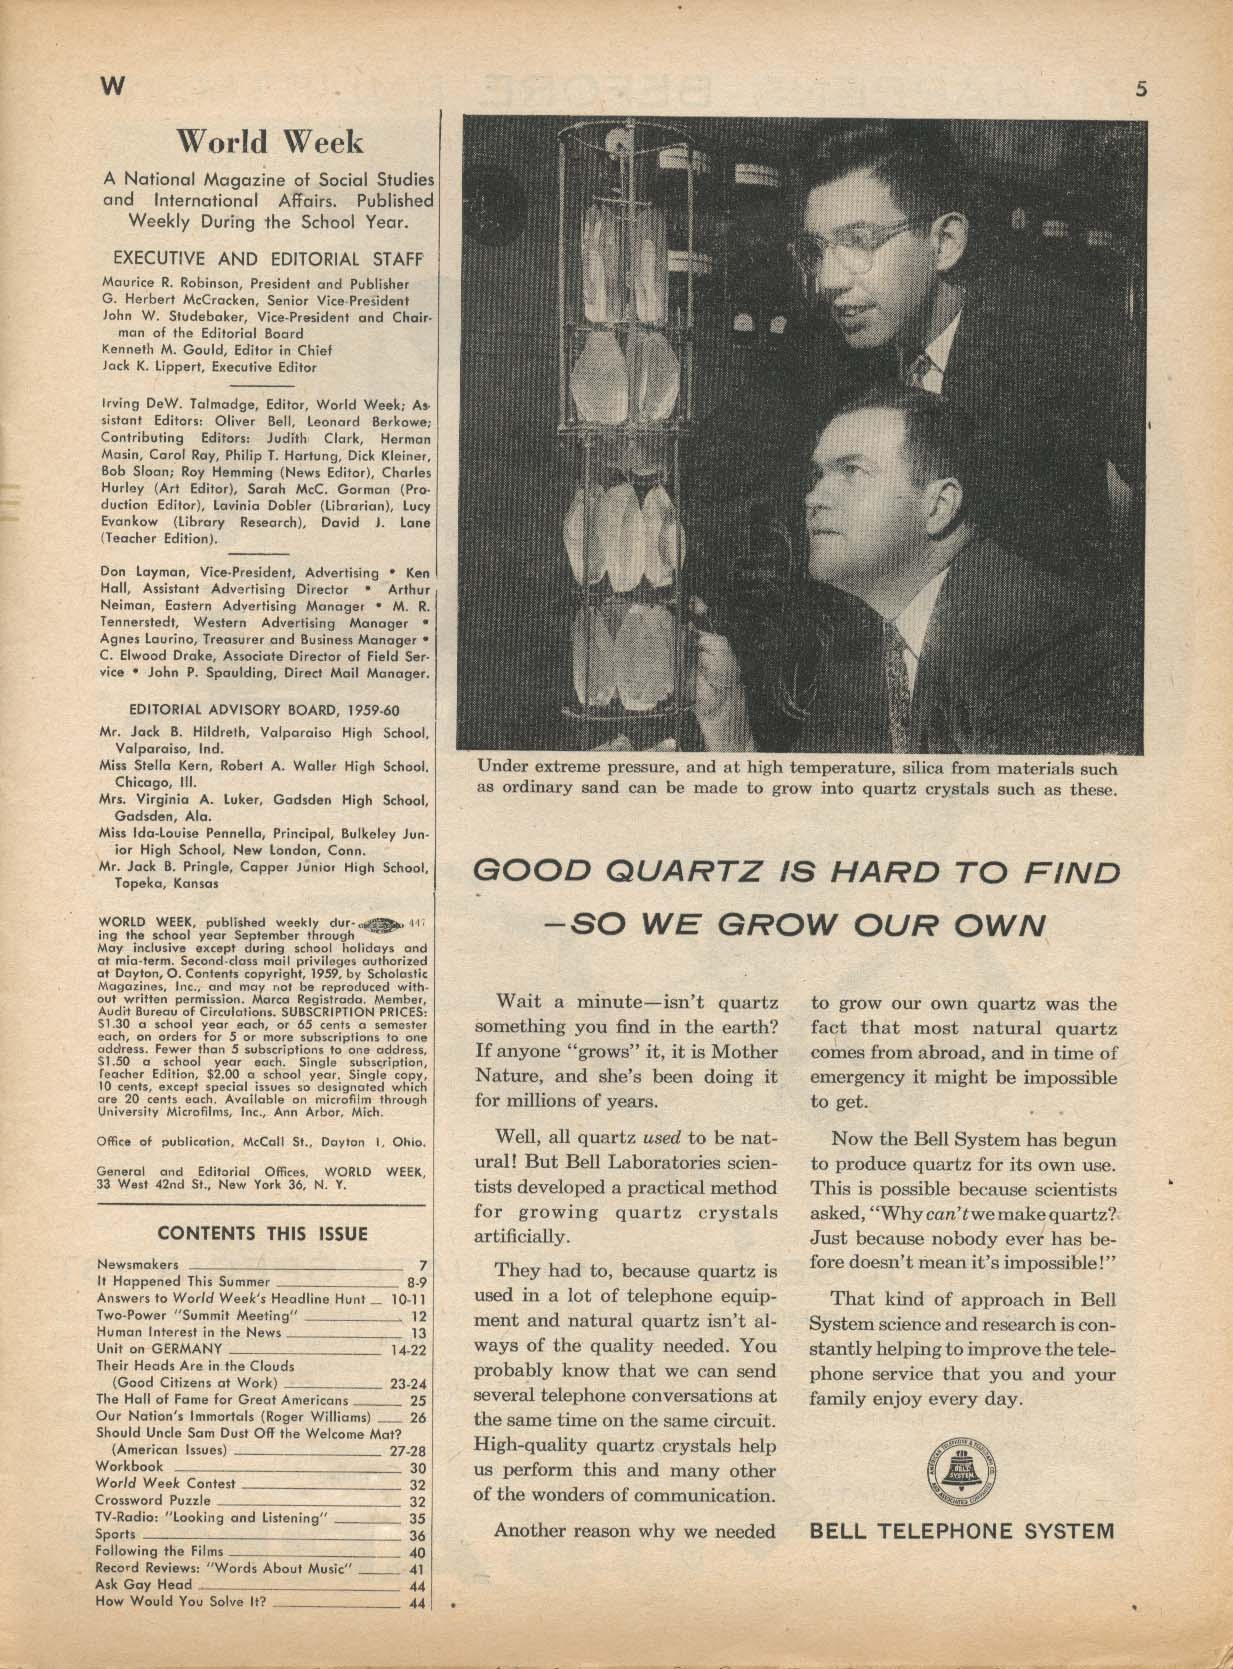 WORLD WEEK Konrad Adenauer Germany unit 9/16 1959